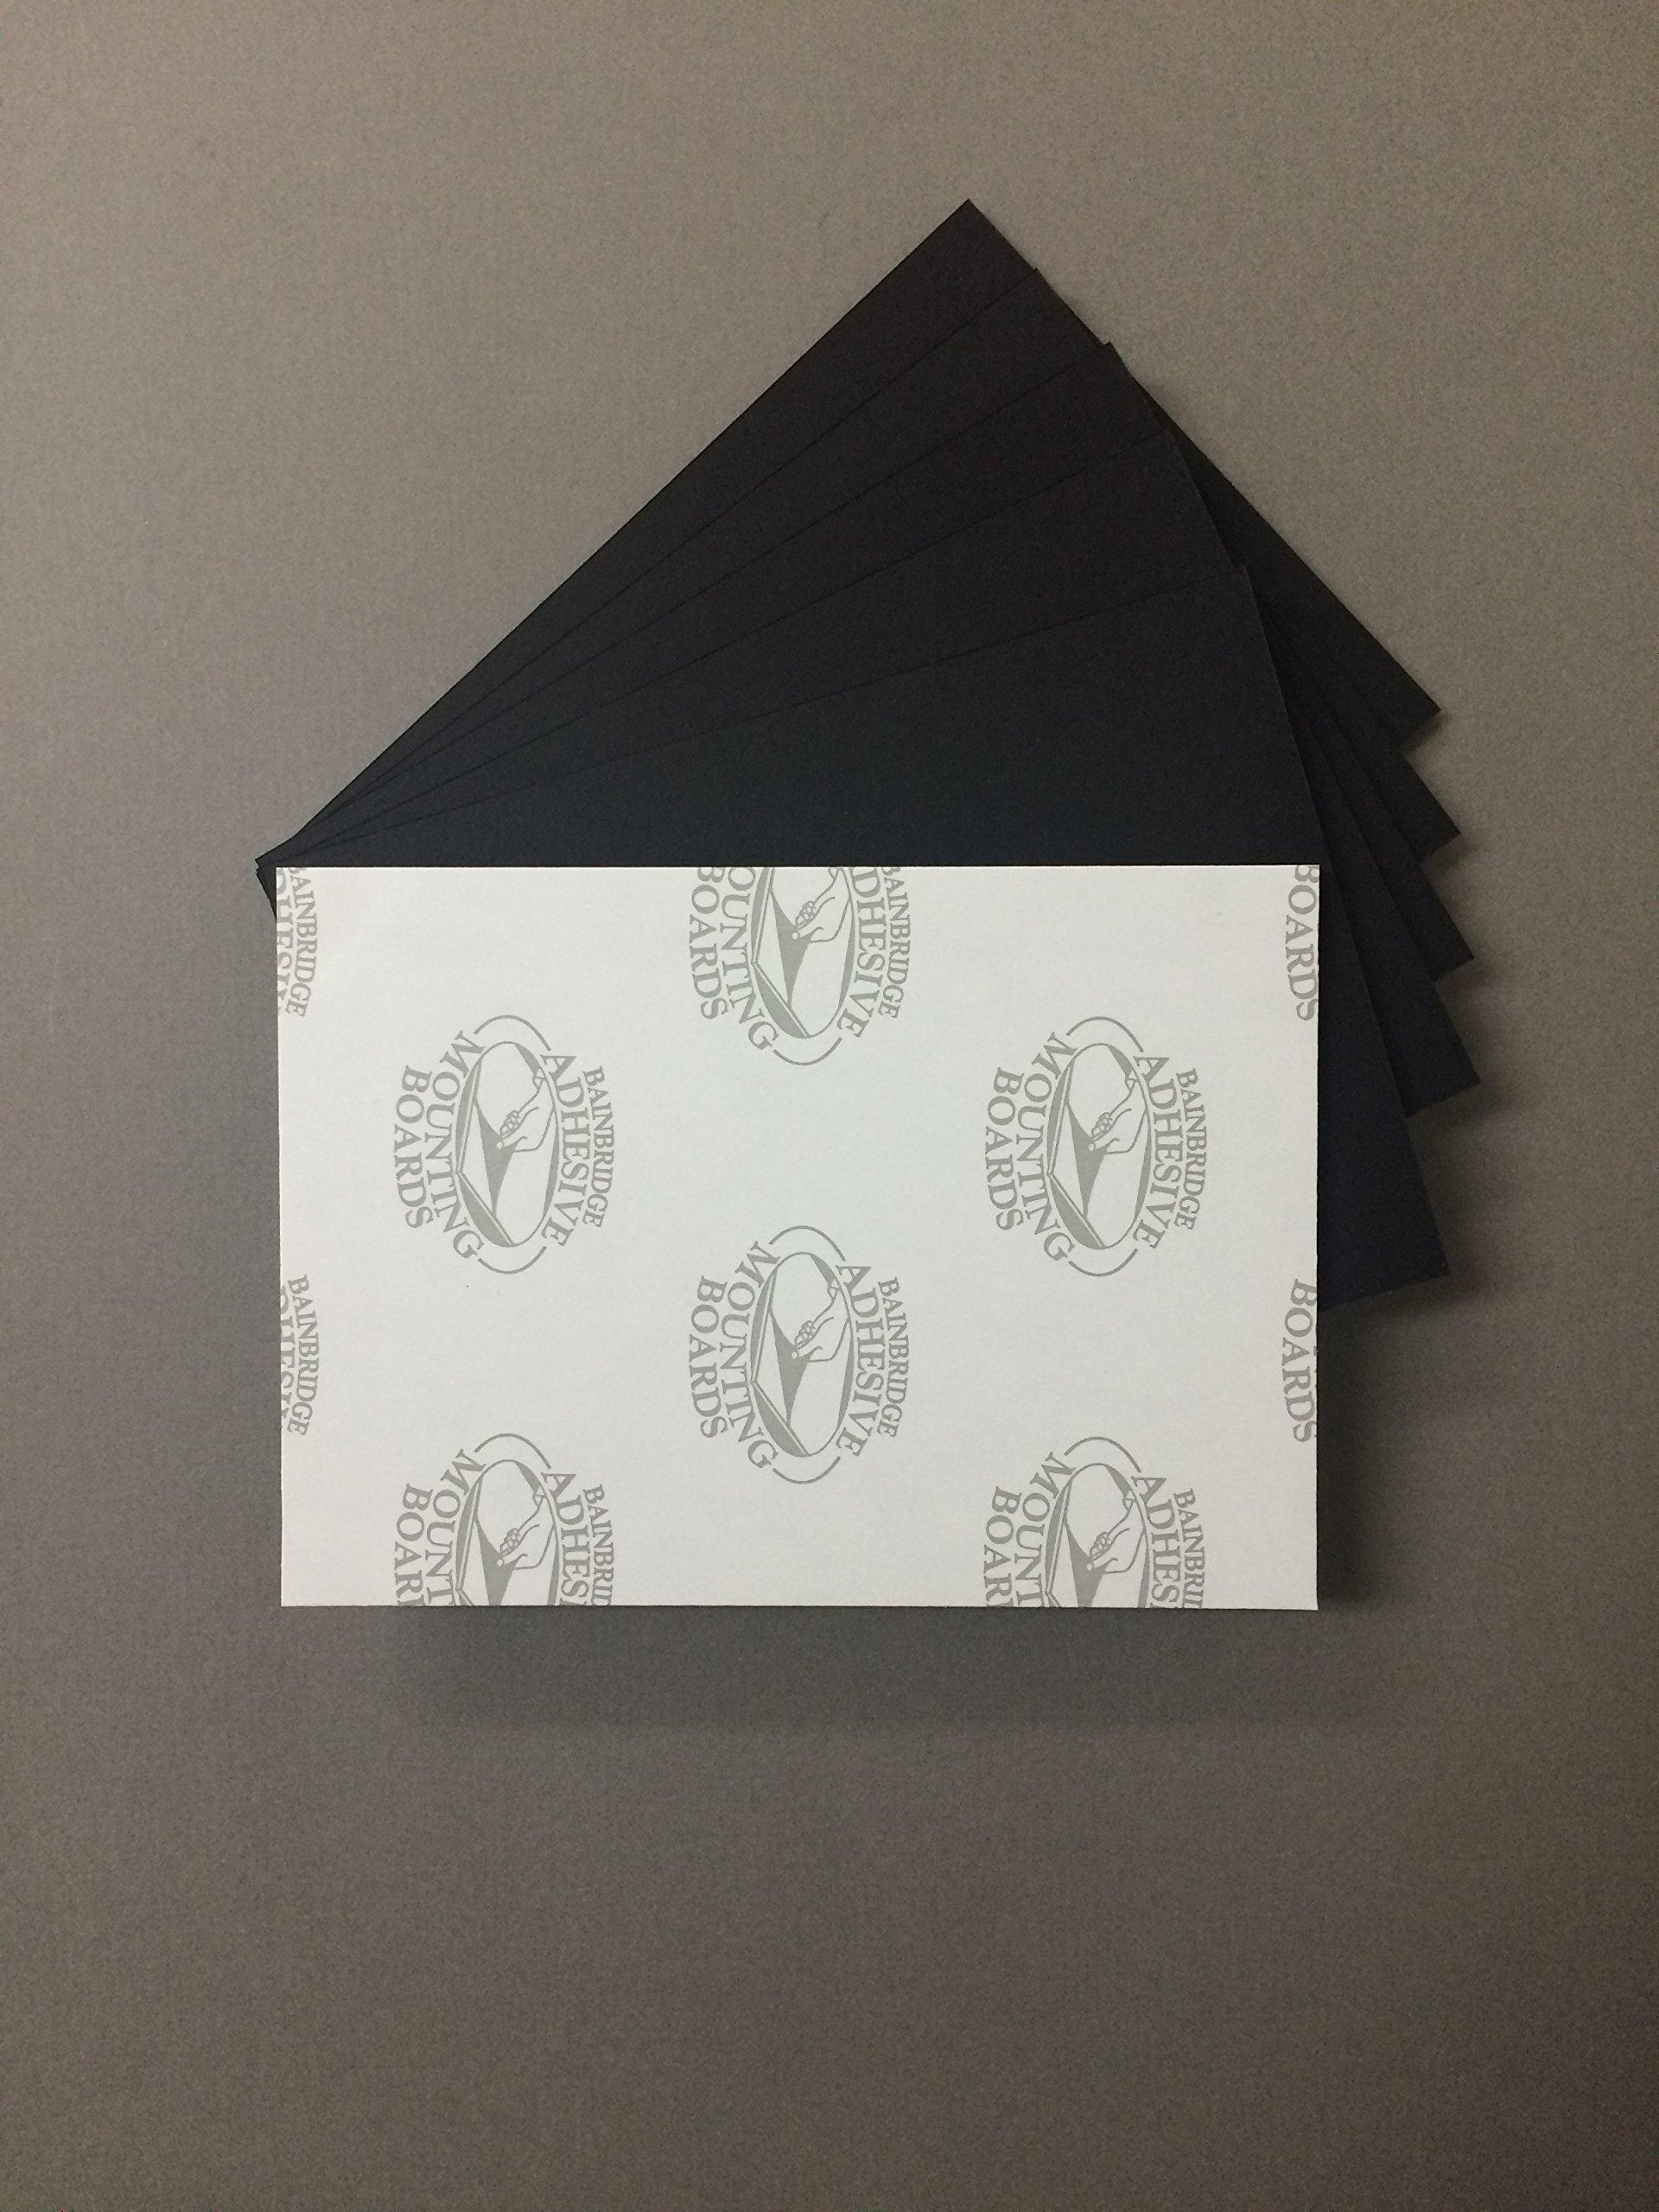 Pack of 5 11x14 3/16'' Black Self Adhesive Foam Core Backings